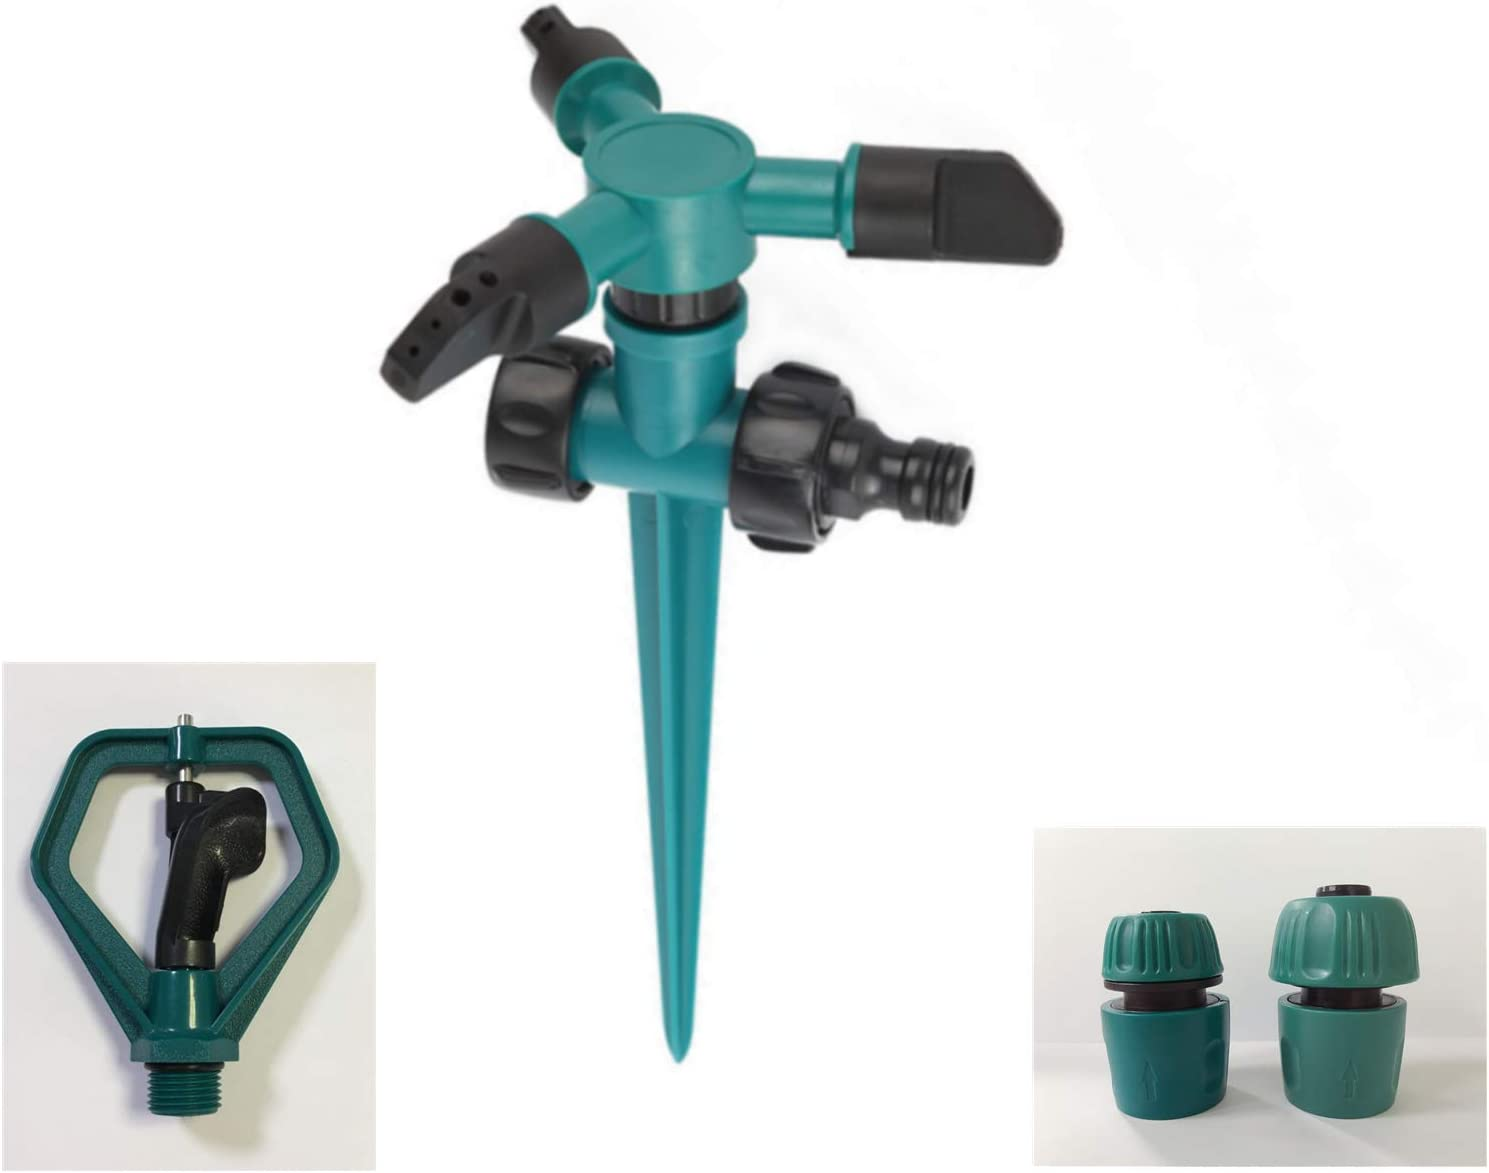 6 PCS Lawn Sprinkler Kit Inground, Adjustable Yard Sprinklers Spike Base Gardening Watering System 360 Degree Rotating Irrigation Machine Green Color (2 Sprinklers Heads+2 Quick Connects)